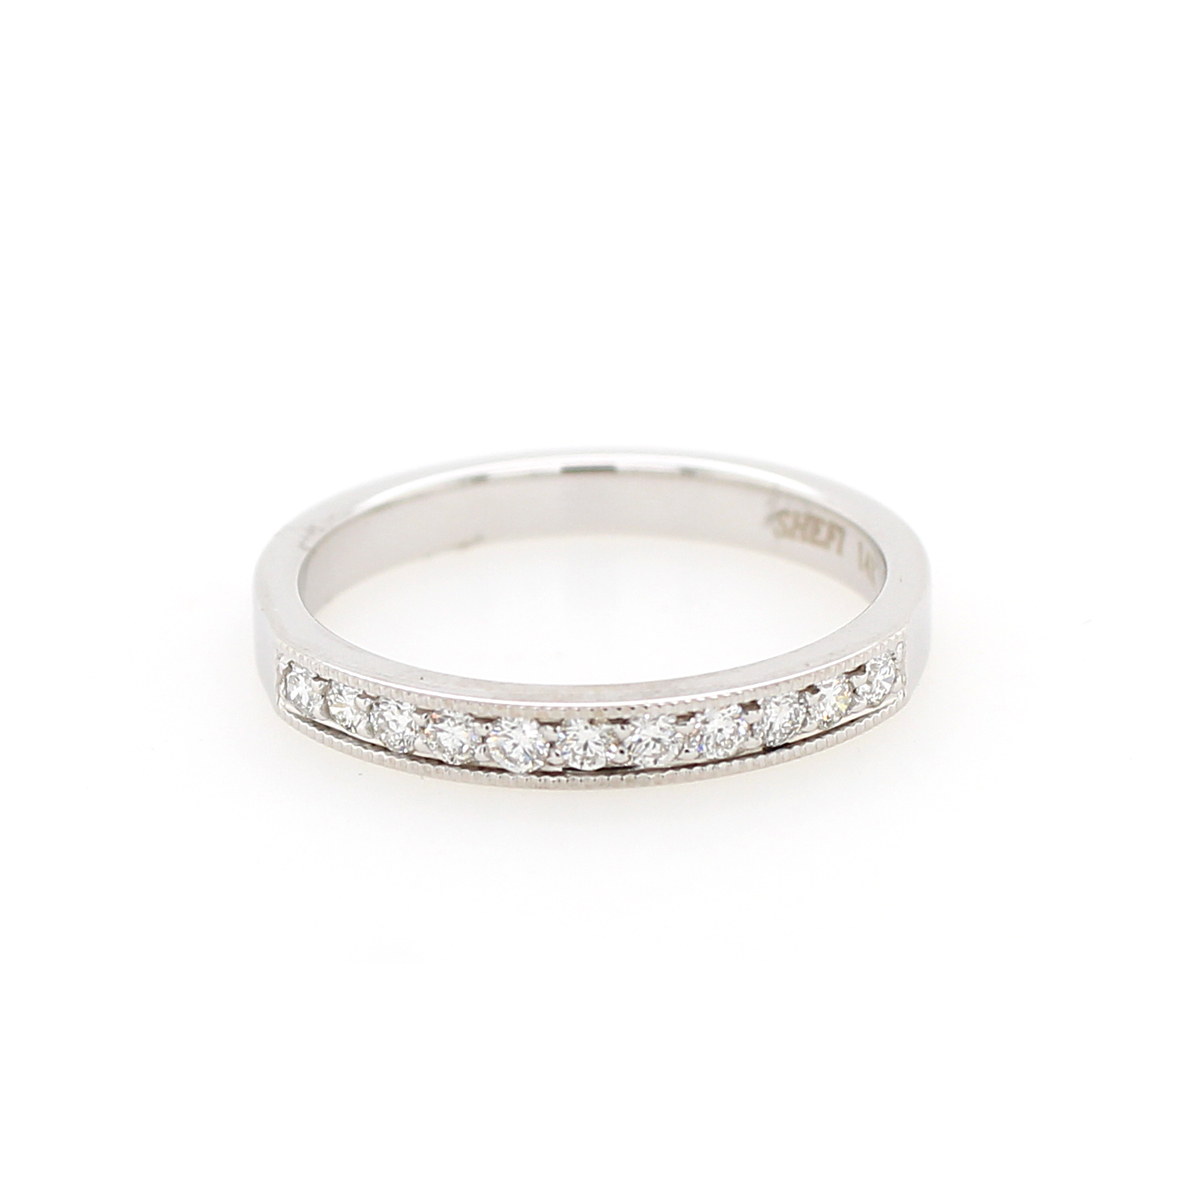 Shefi Diamonds 14 Karat White Gold .25 Carat Millgrain Edge Wedding Band